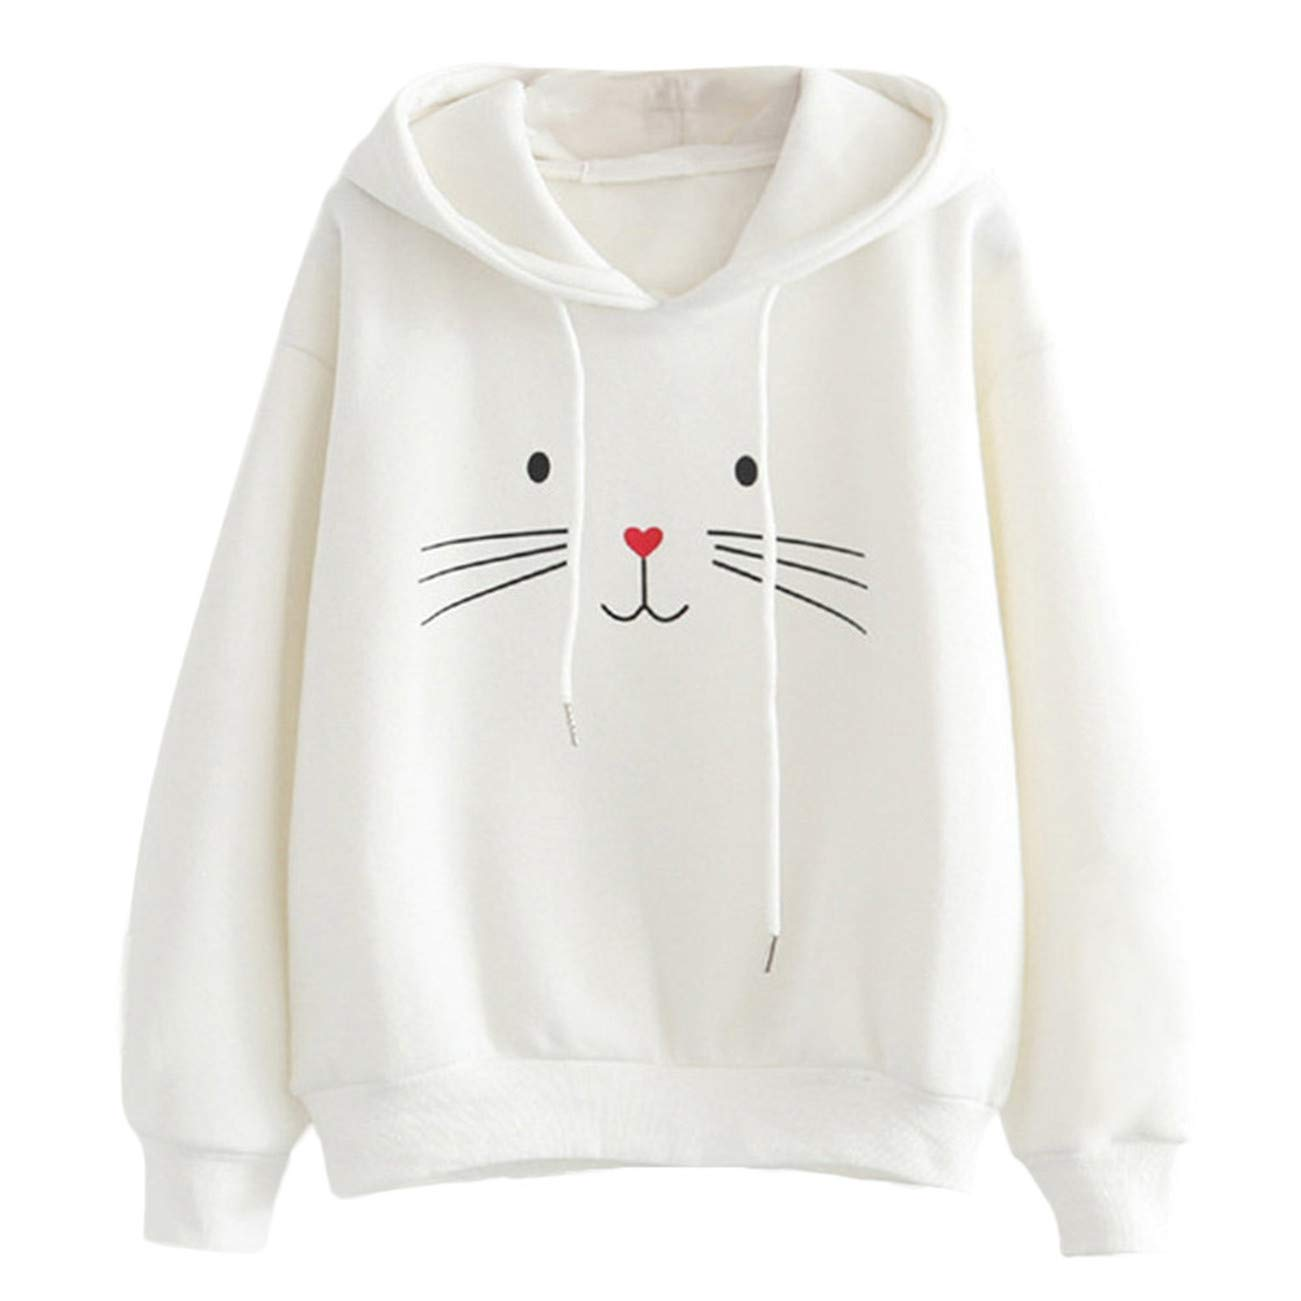 AMUSTER -Inverno Autunno Donna Elegante Cerimonia Fashion Casual Manica Lunga Cat Stampa Hooded Felpa Camicetta Top T Shirt